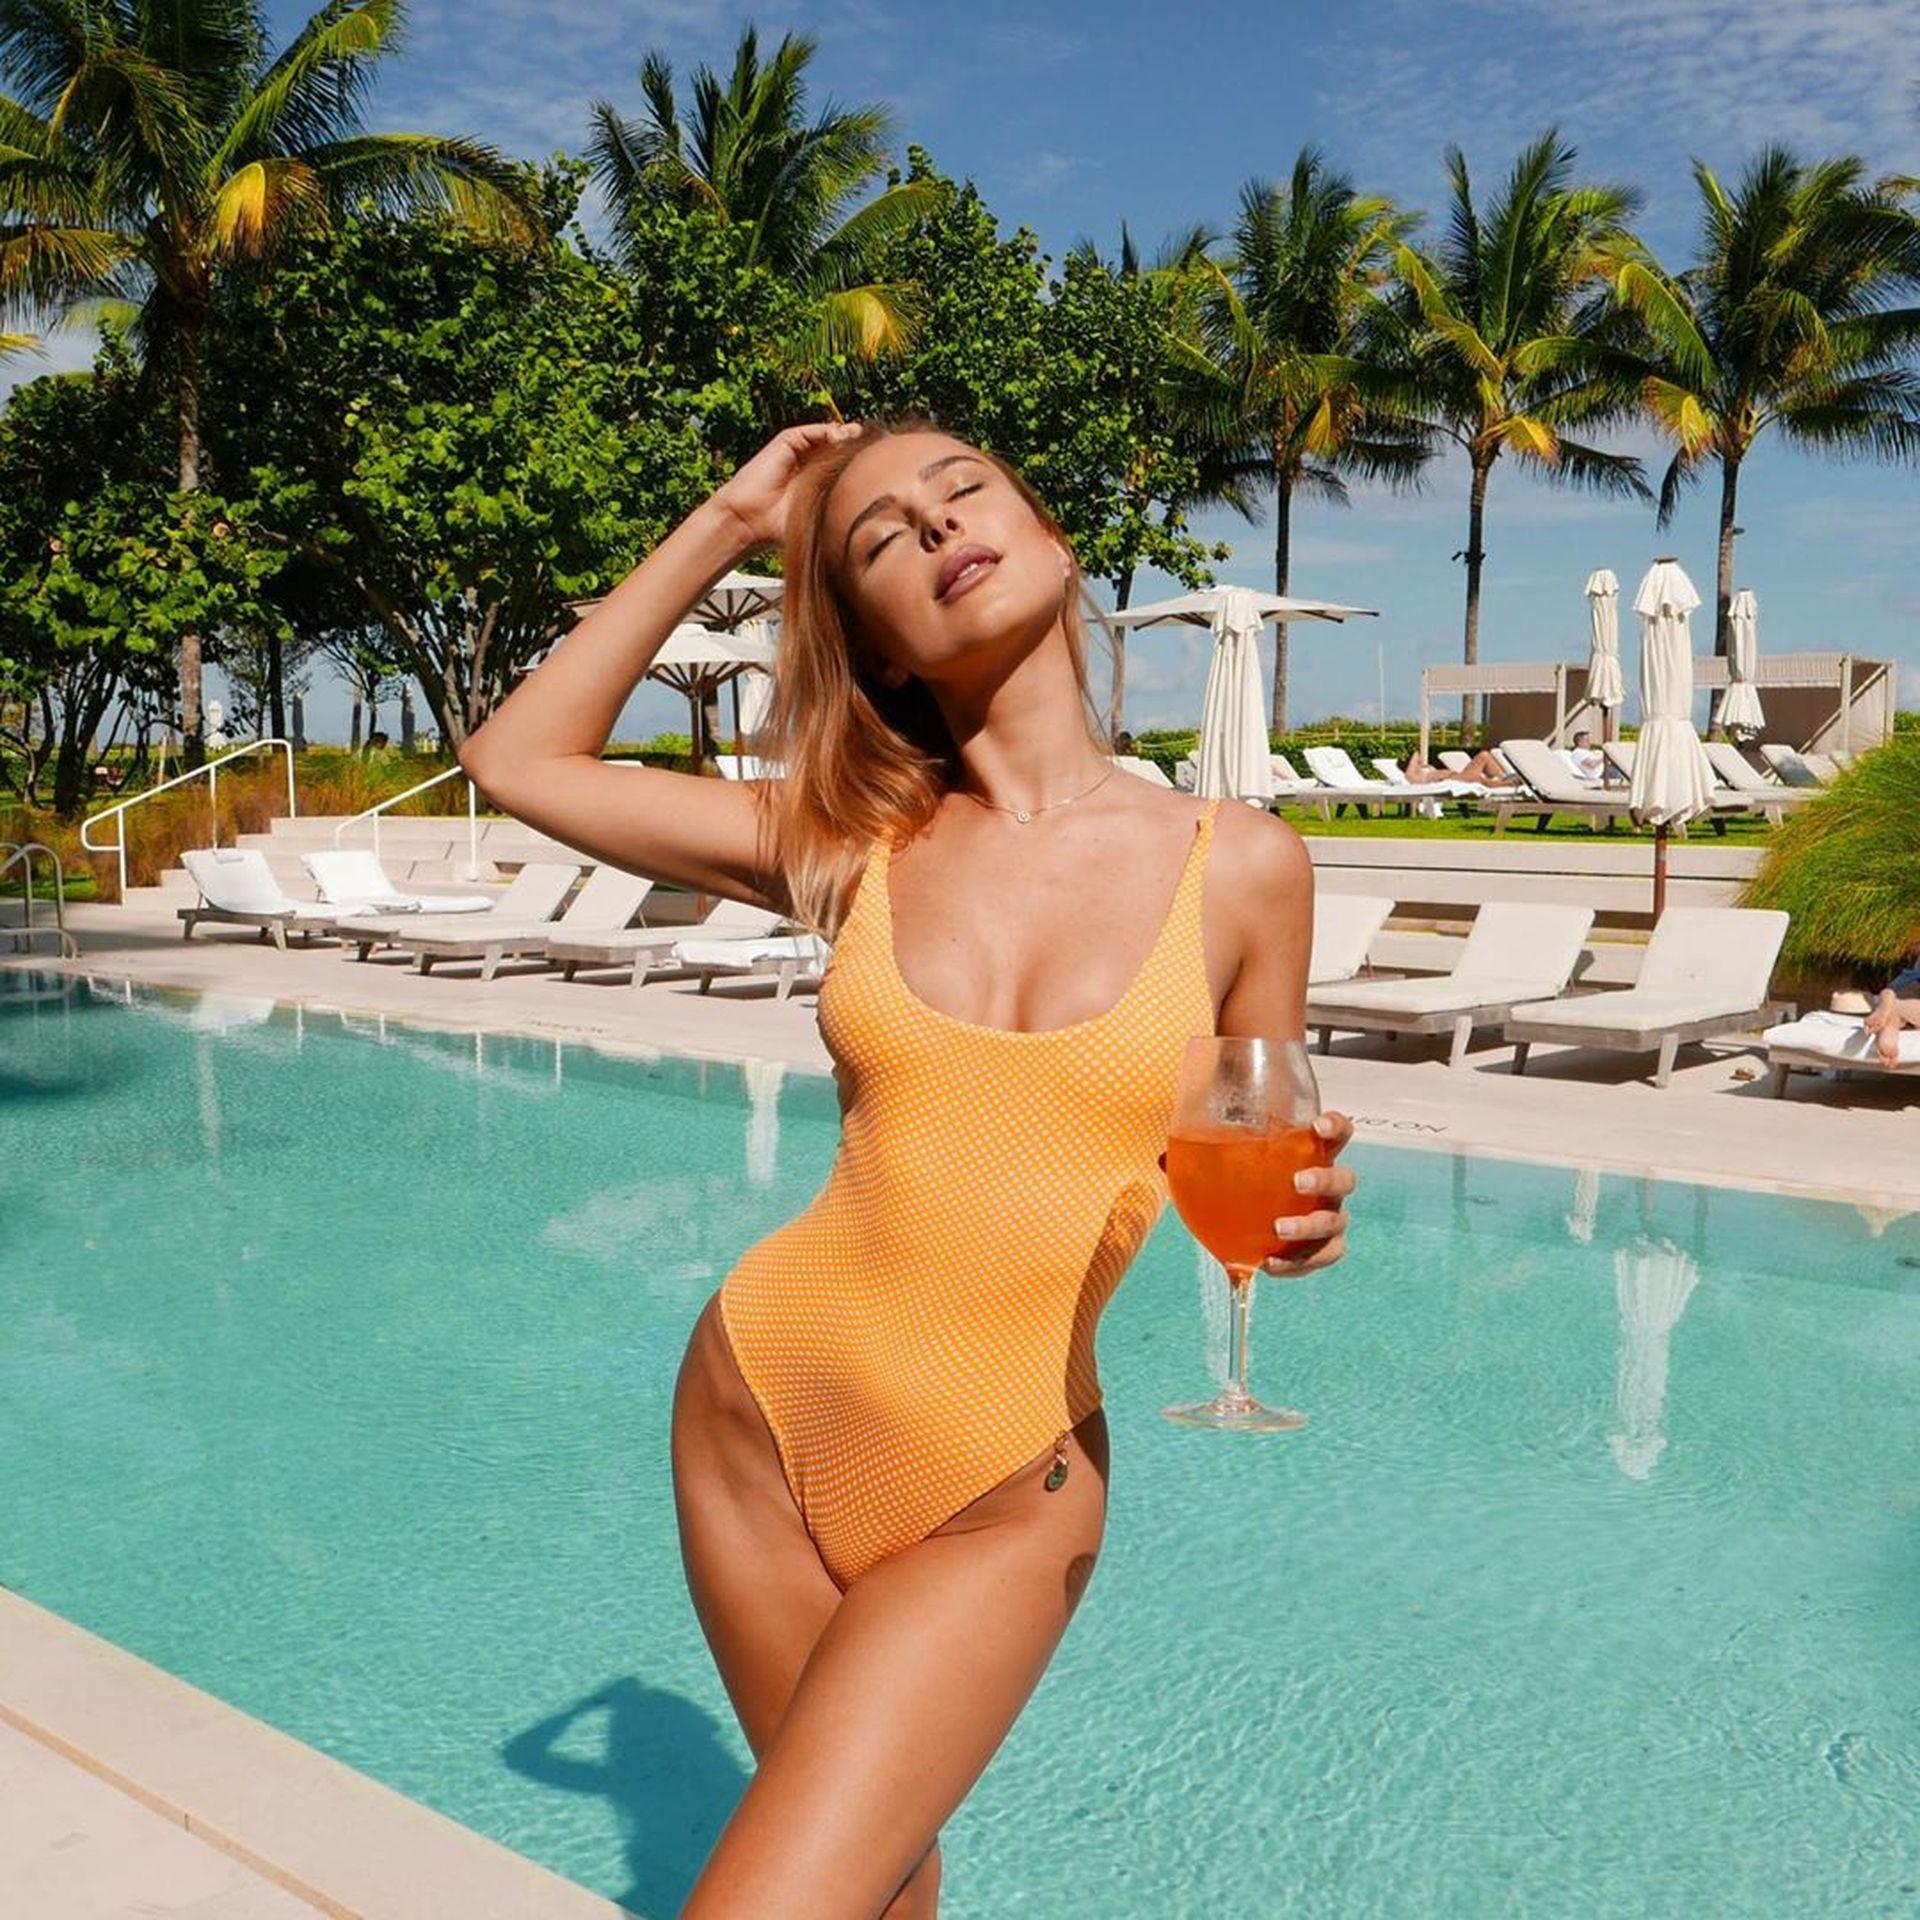 Kimberley Garner Seen Wearing An Orange Swimsuit In Miami 0001